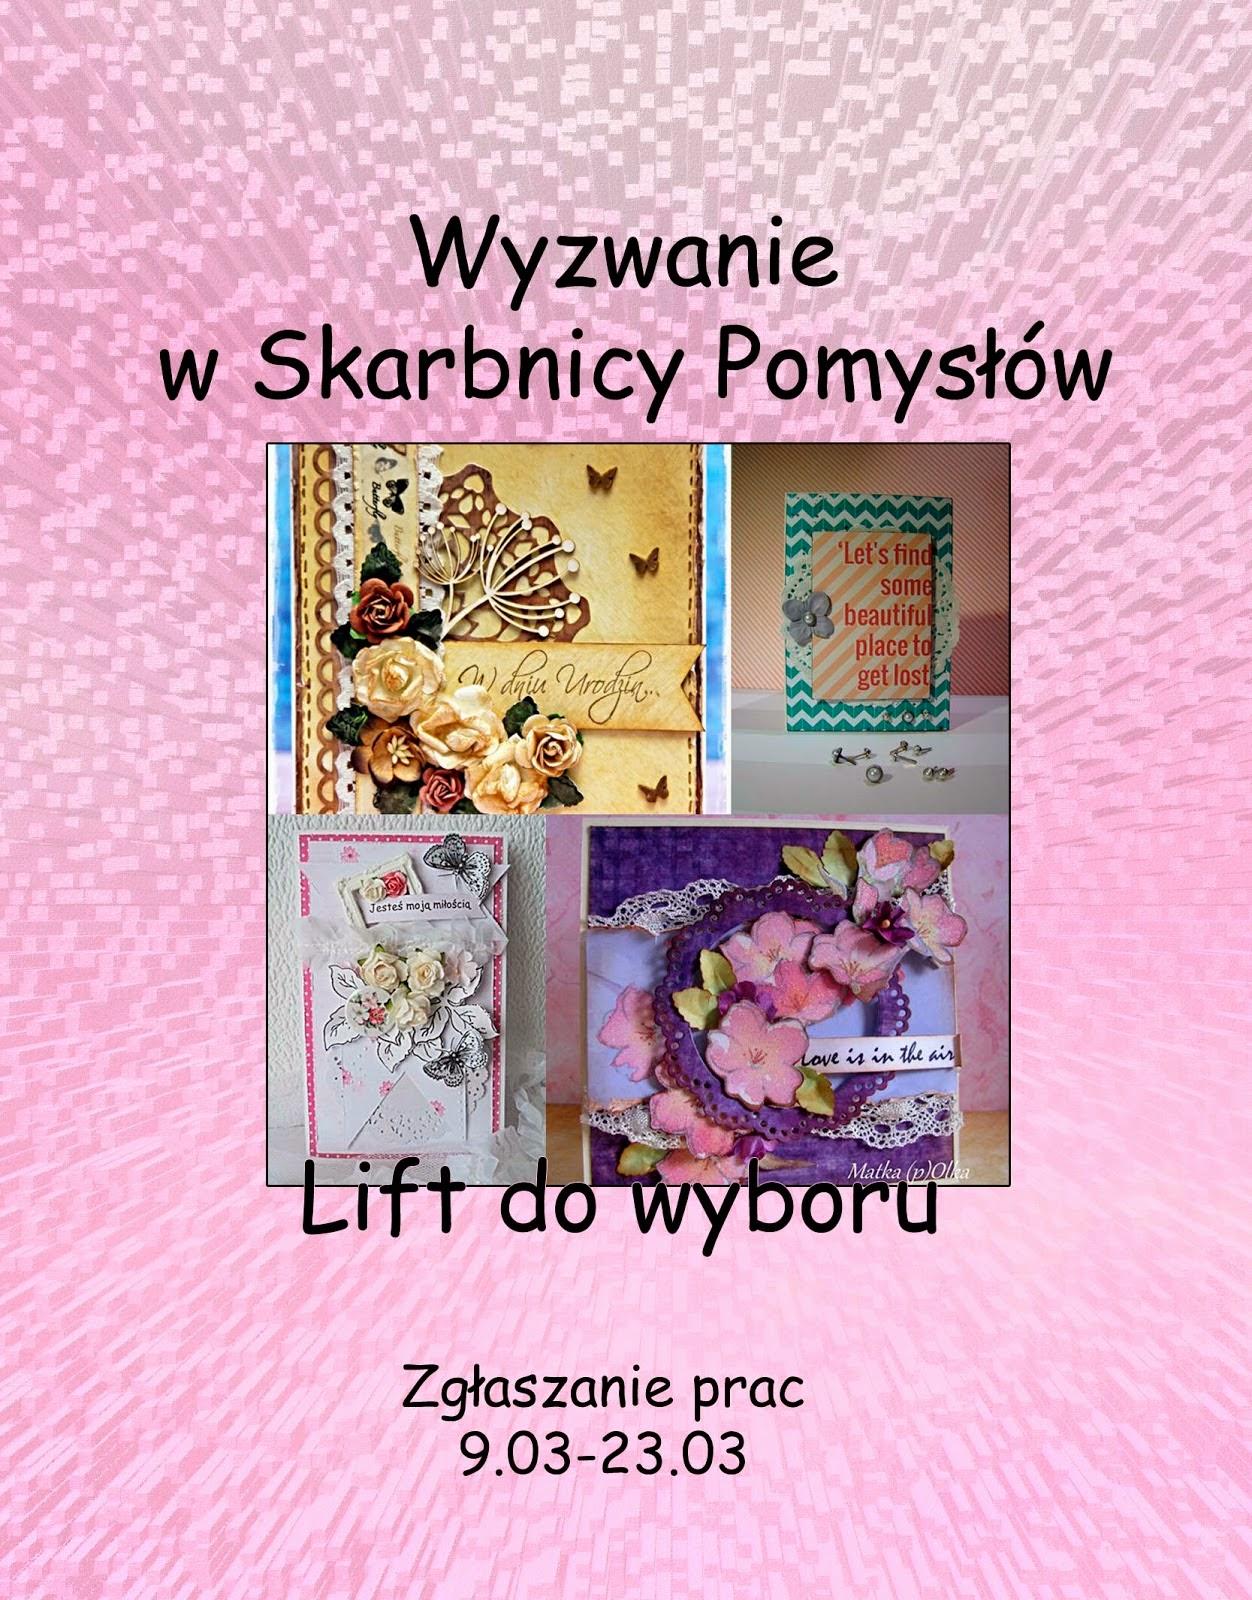 http://skarbnica-pomyslow.blogspot.com/2014/03/wyzwanie-lift-do-wyboru.html